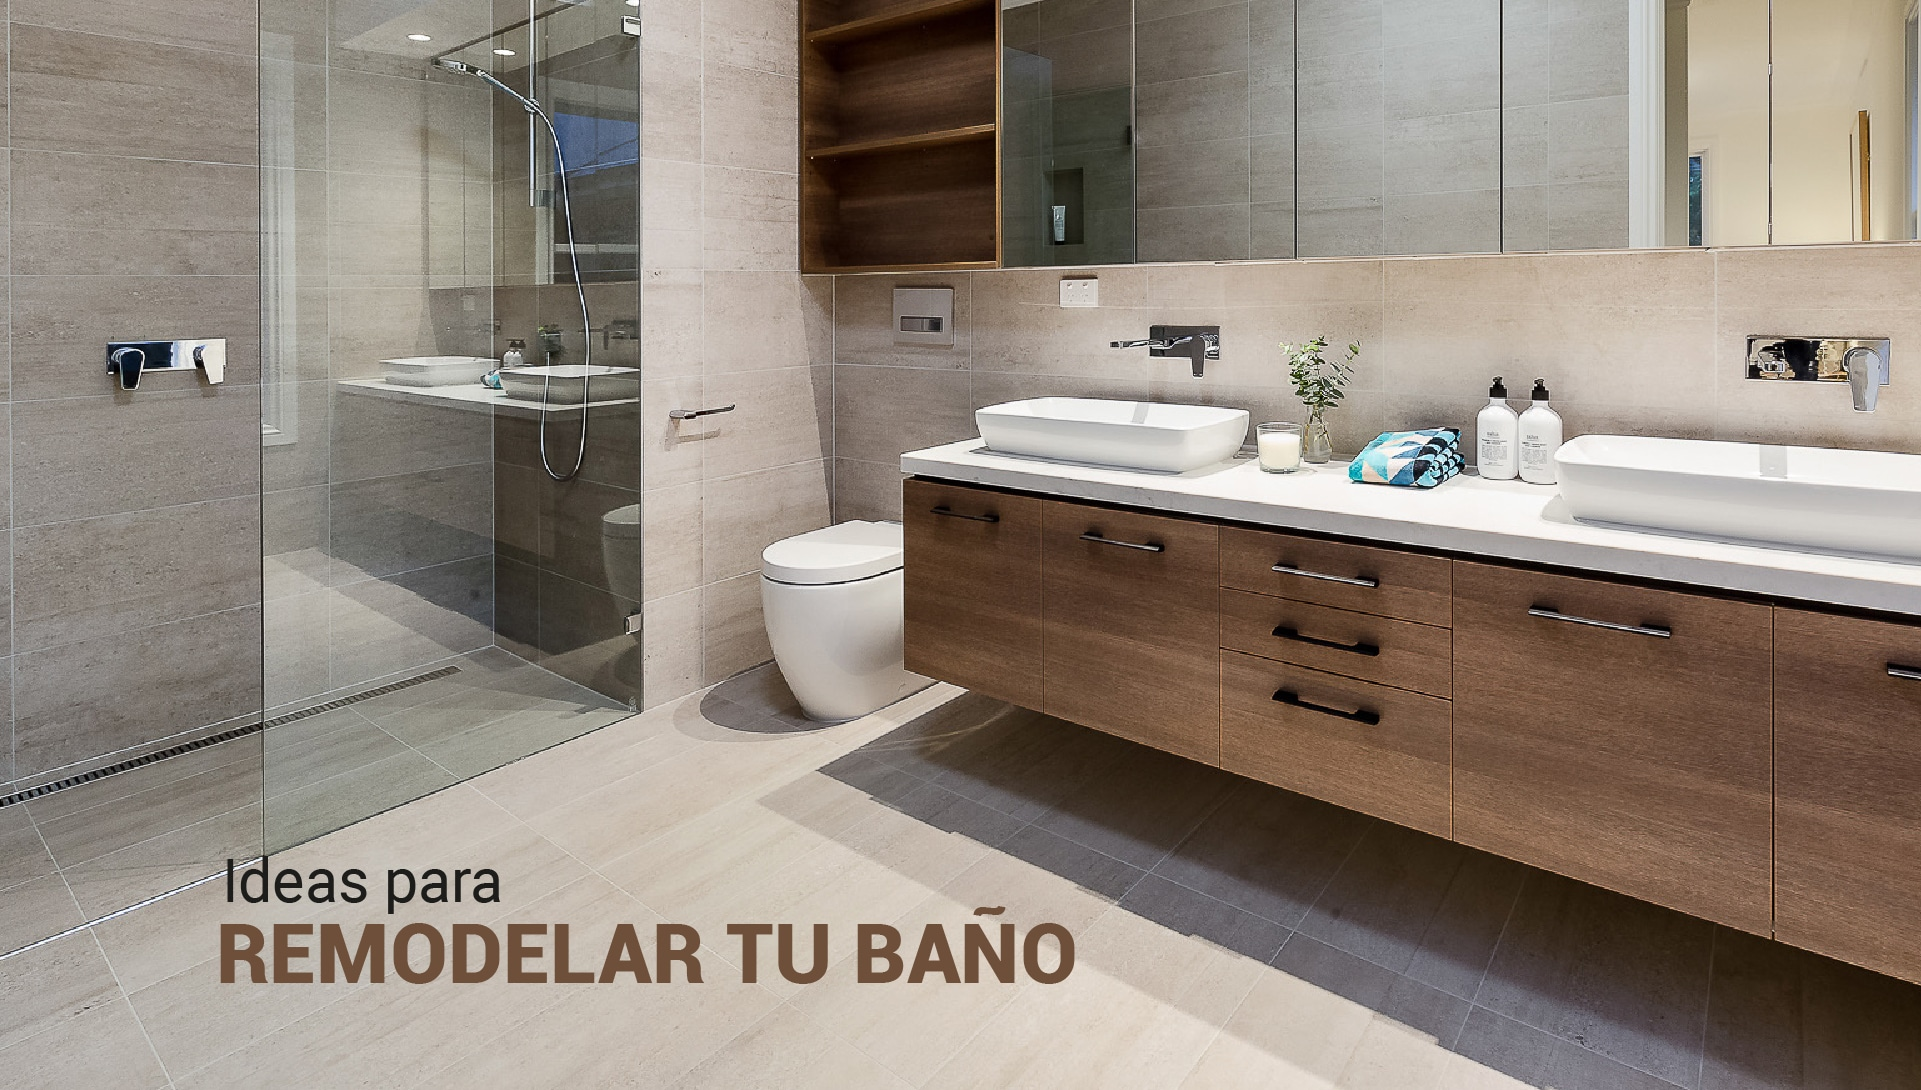 remodelar tu baño